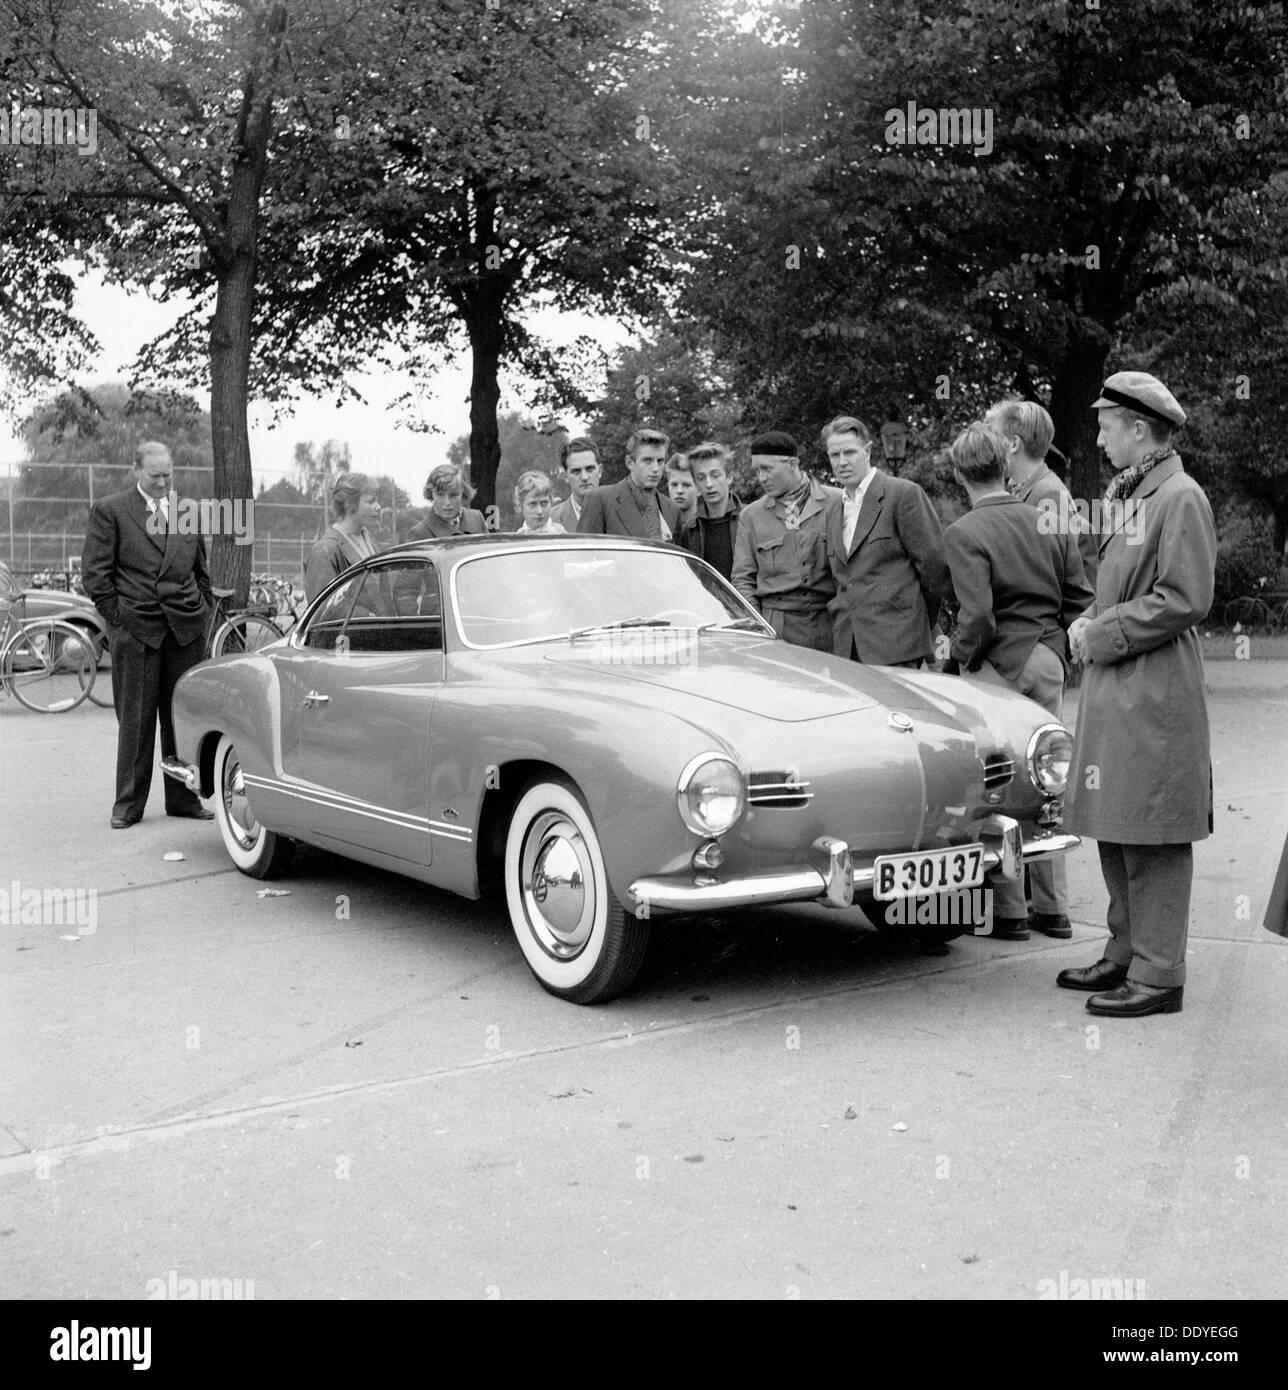 Young men admire the new Volkswagen Karmann Ghia, Landskrona, Sweden, 1955. Artist: Unknown Stock Photo